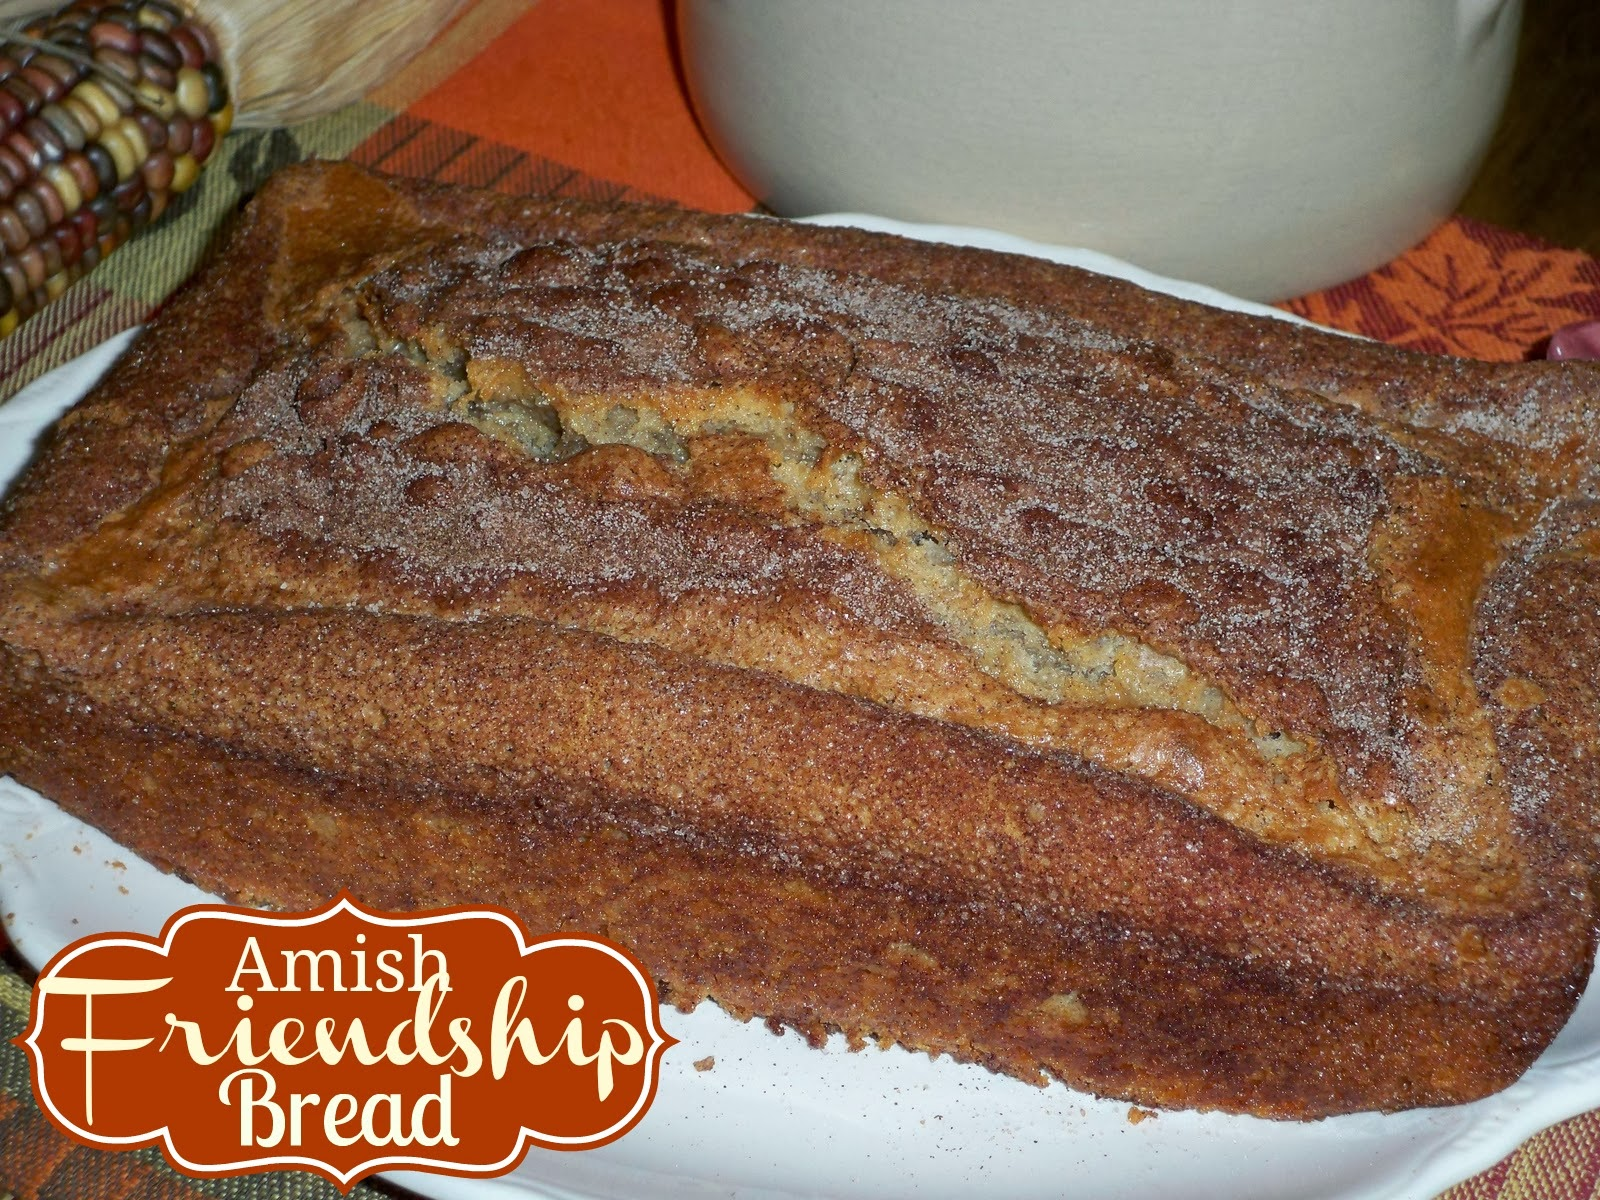 Gramma's in the kitchen: Amish Friendship Bread made with Vanilla ...